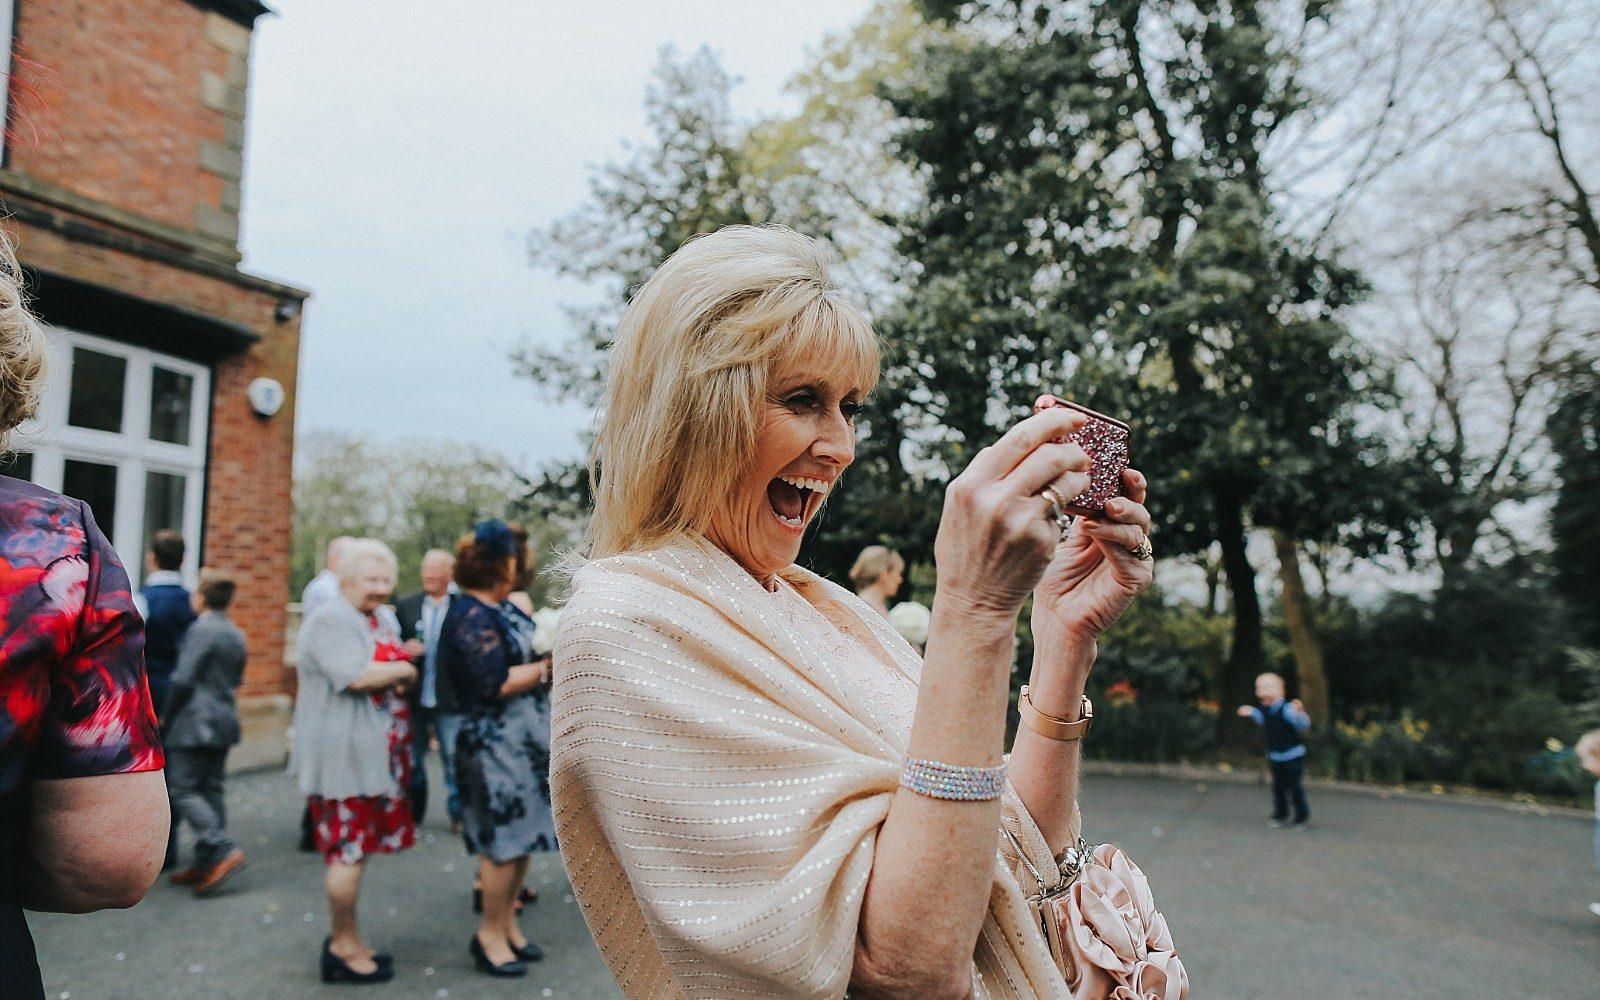 Ahfield-House-Wedding-Venue-Photography-Photographer-Wigan-embee-Photography-Matt-Burgess_0130